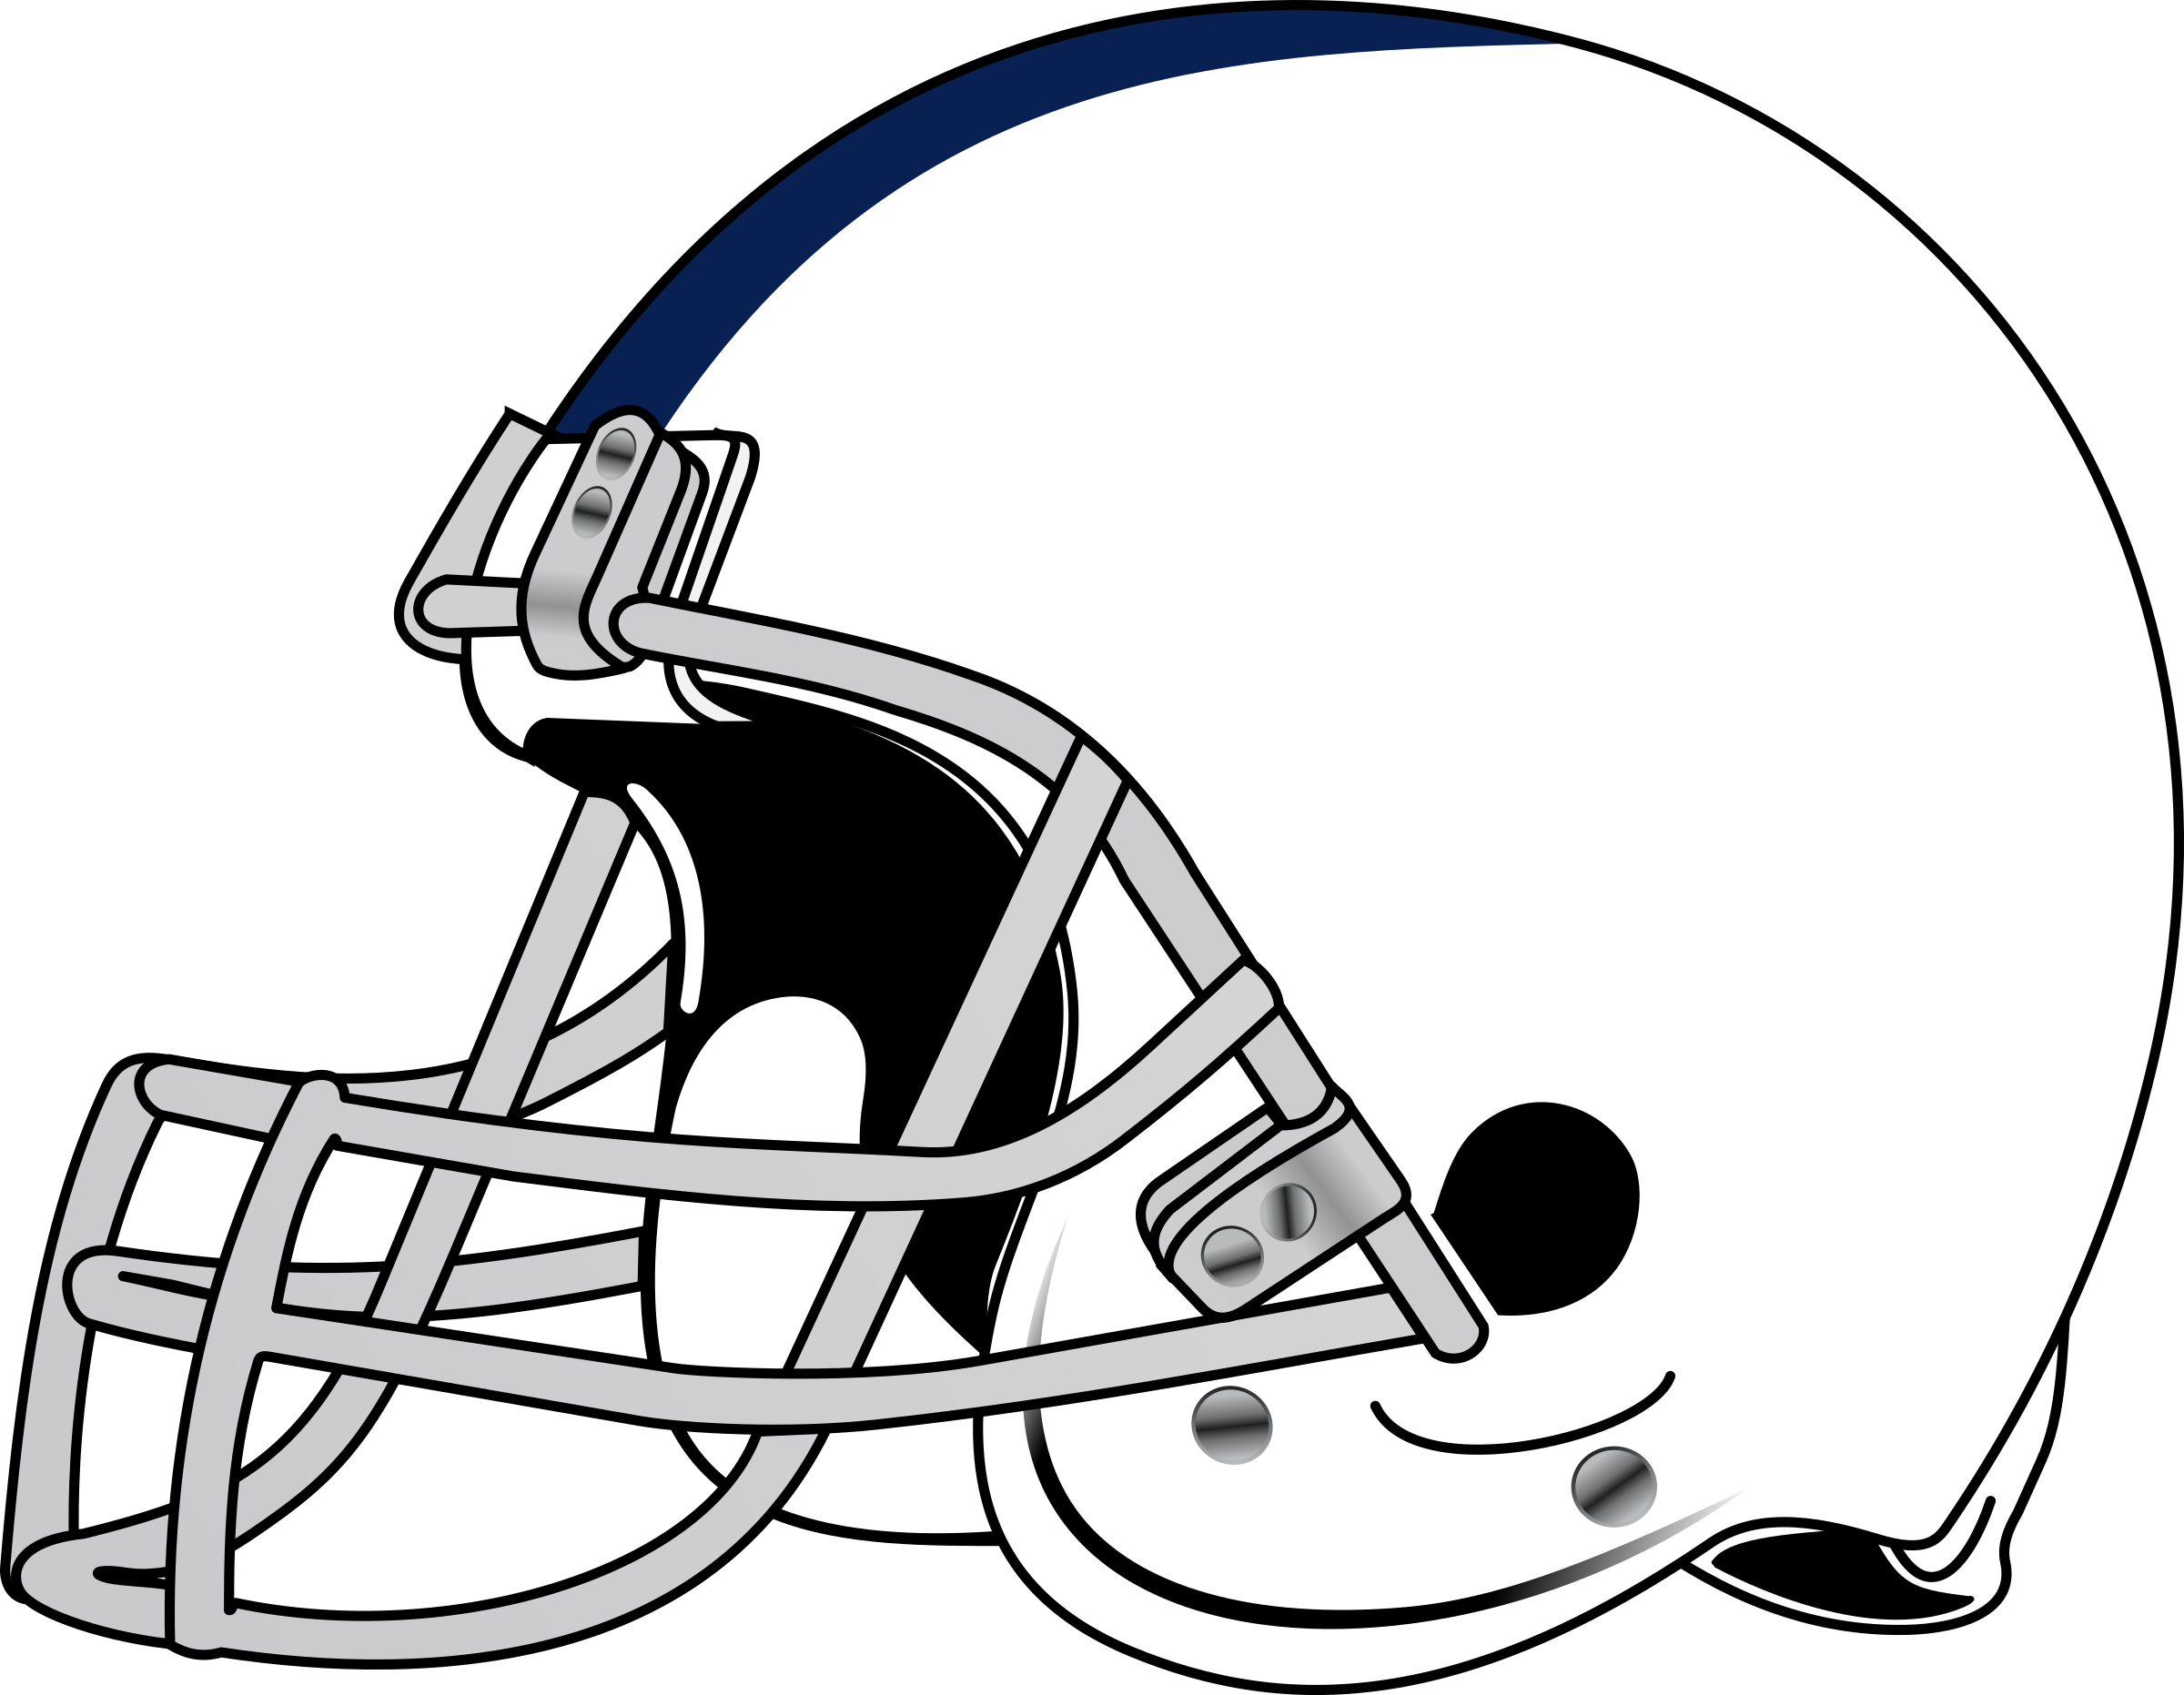 Football helmet clip art free clipart image